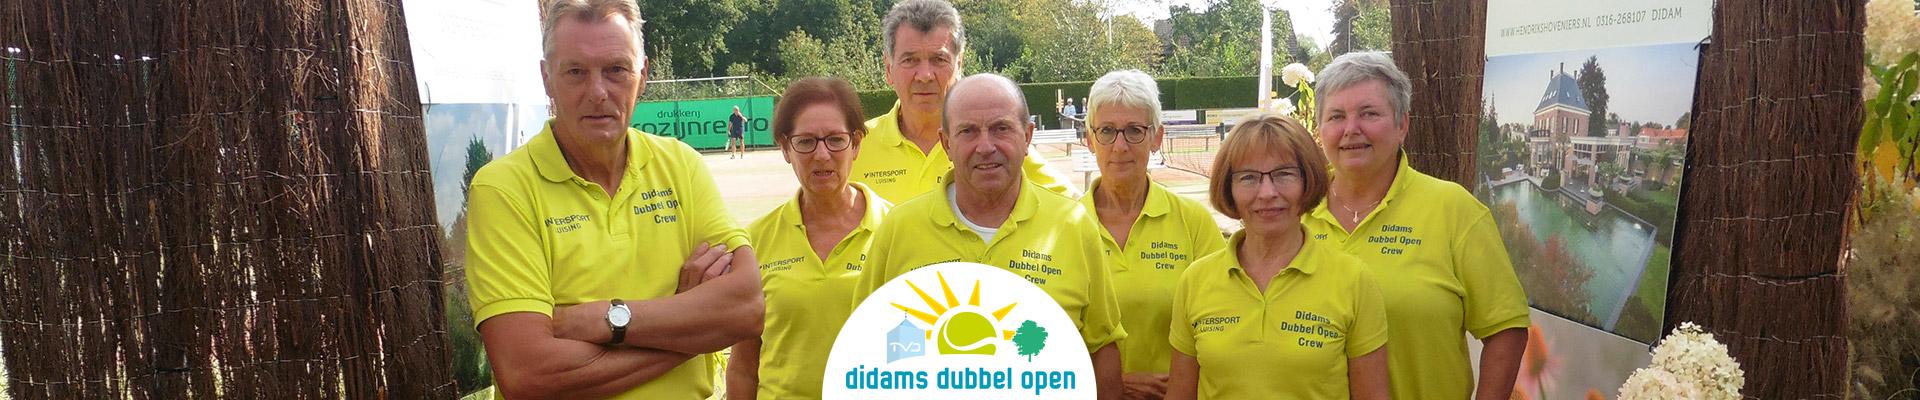 tvd_slider_didams_dubbel_open_crew